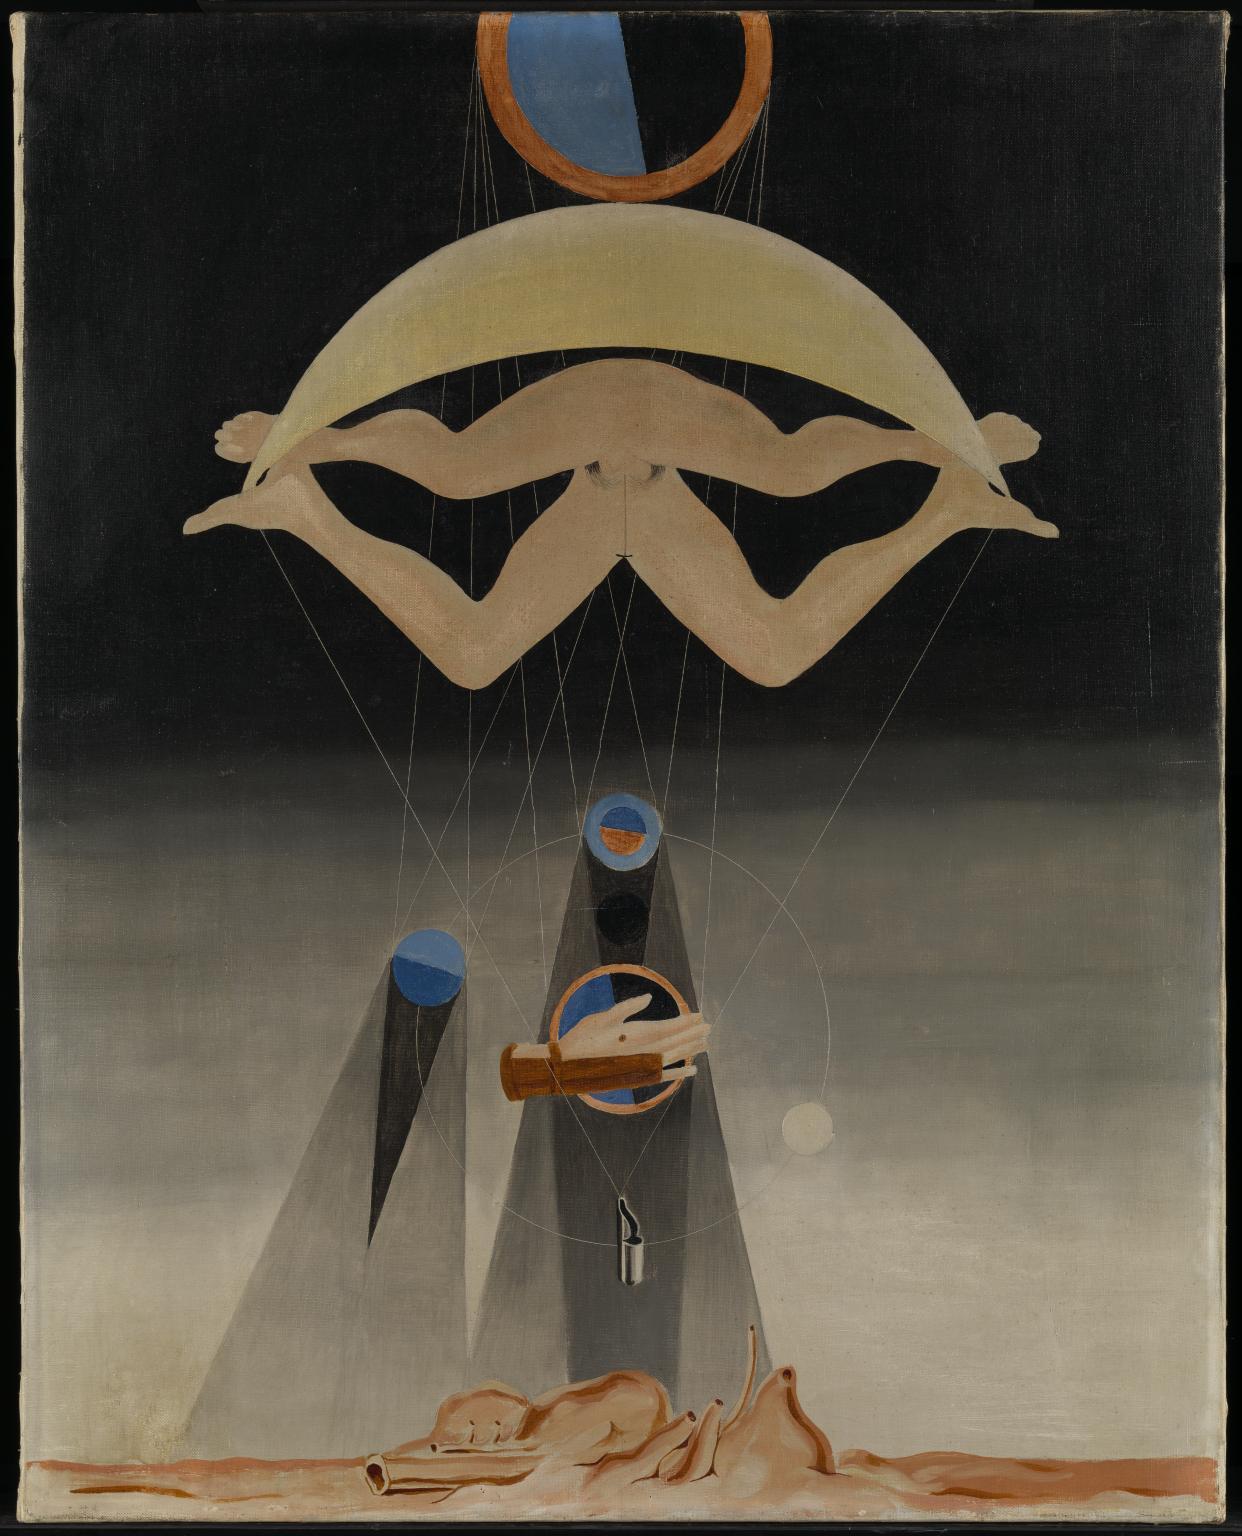 Max Ernst, Les hommes n'en sauront rien (1923; olio su tela, 80,3 x 63,8 cm; Londra, Tate Modern)